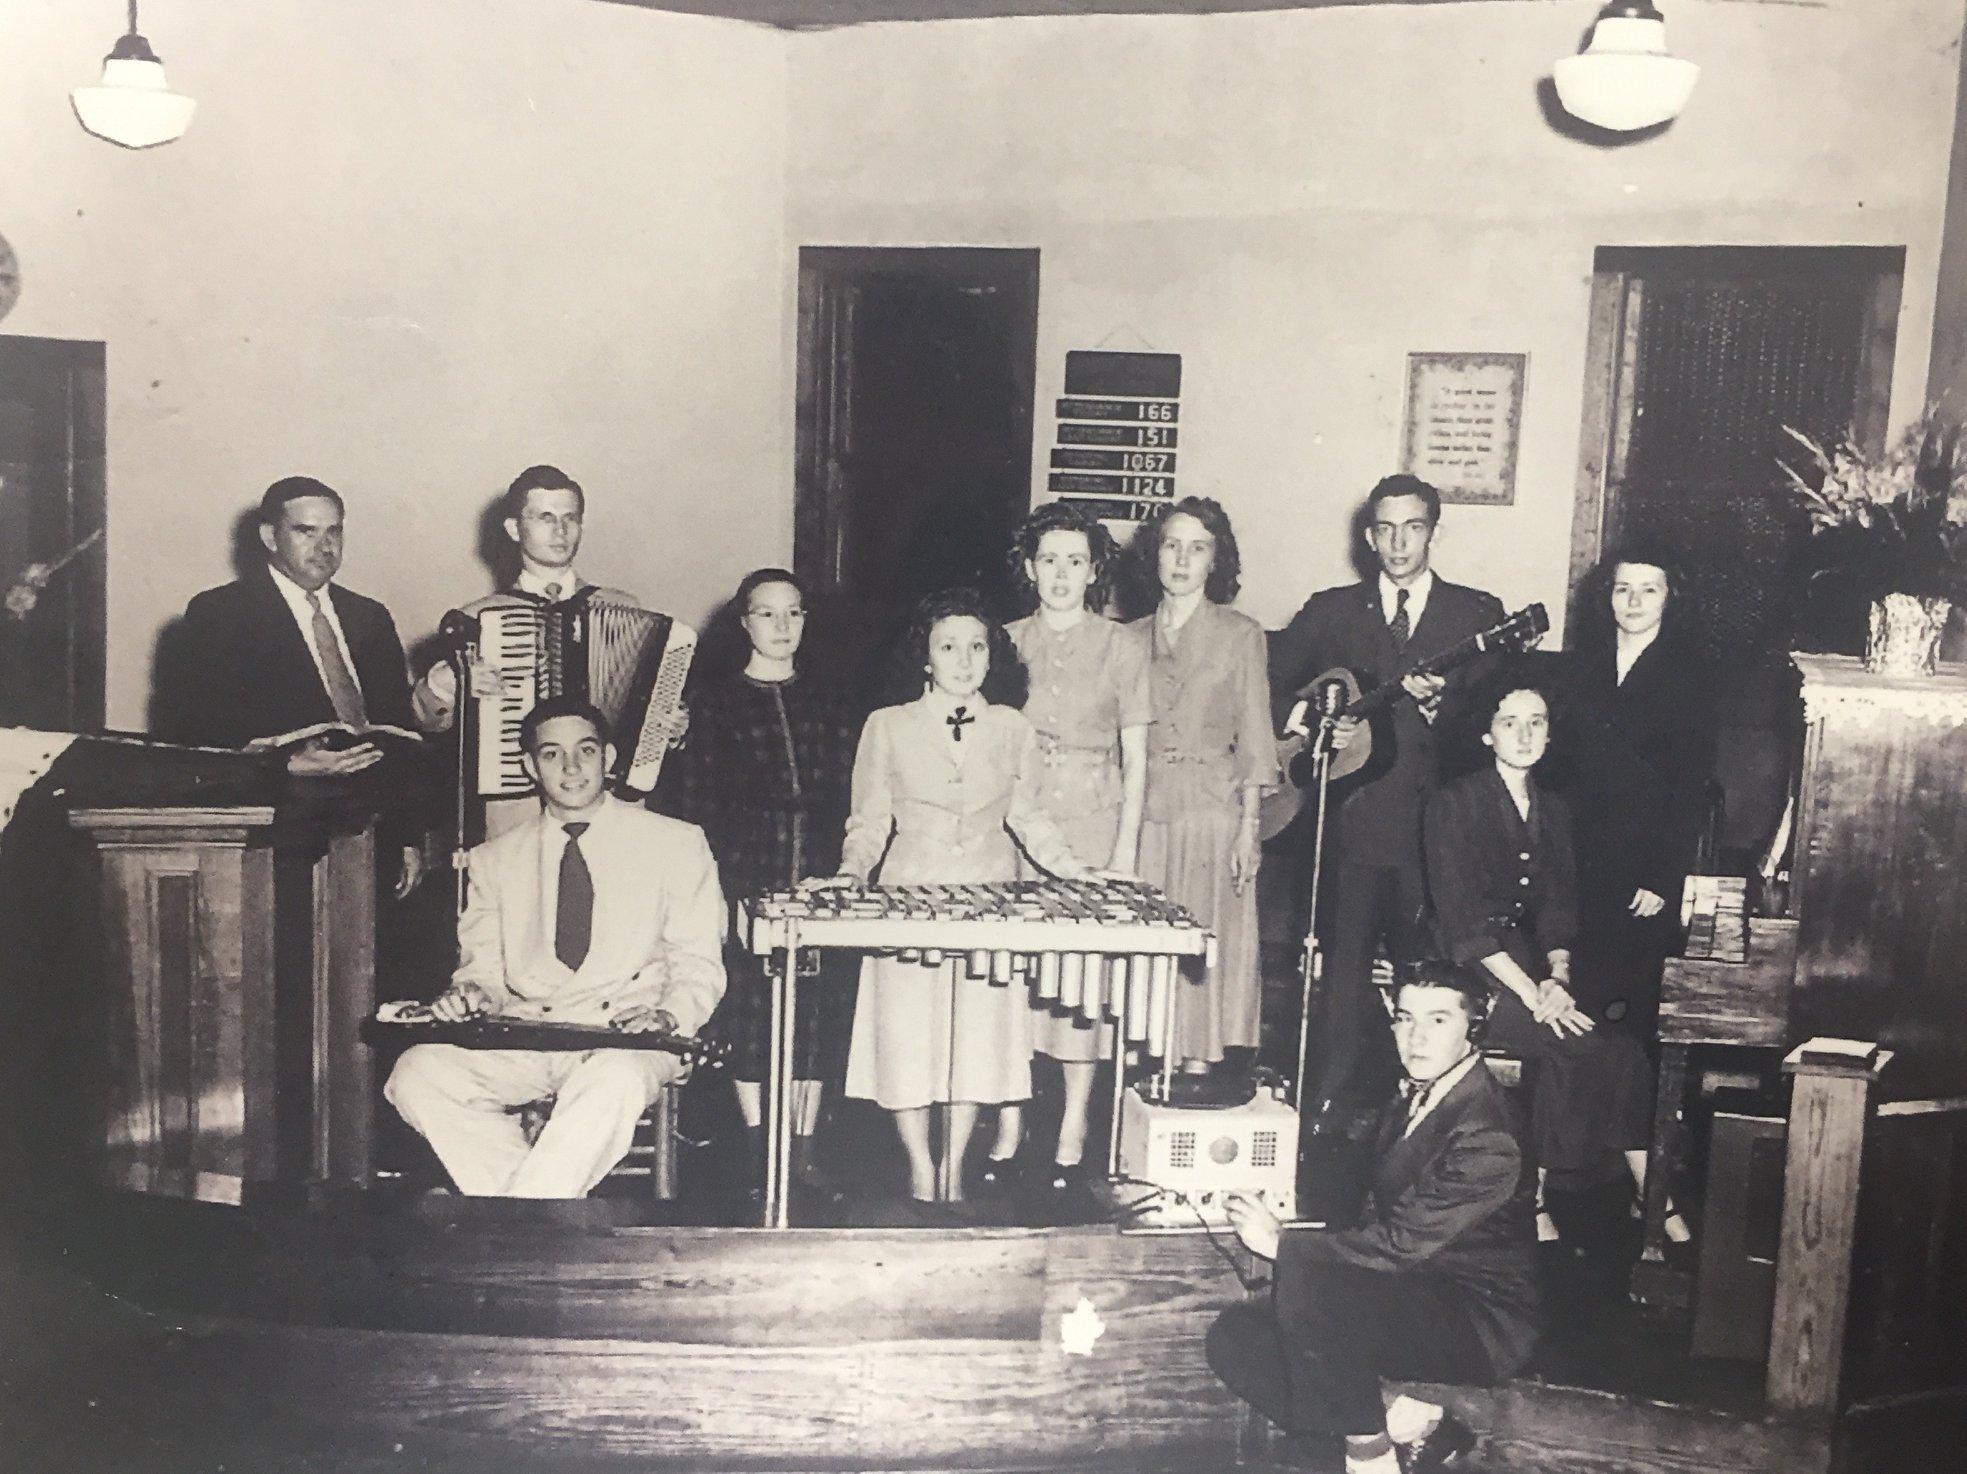 AMCOG circa 1950